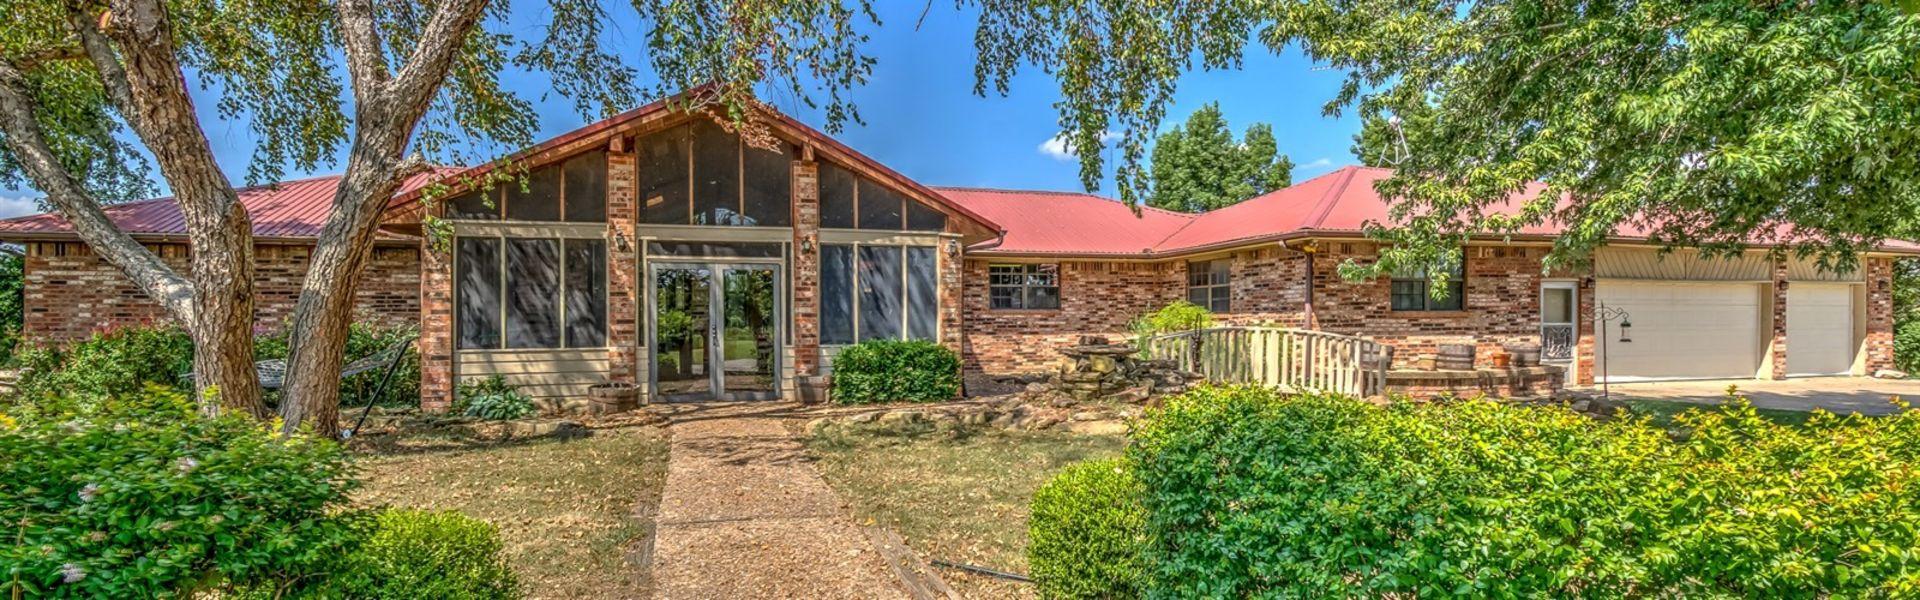 19491 N. 4020 Road, Bartlesville, Oklahoma 74006